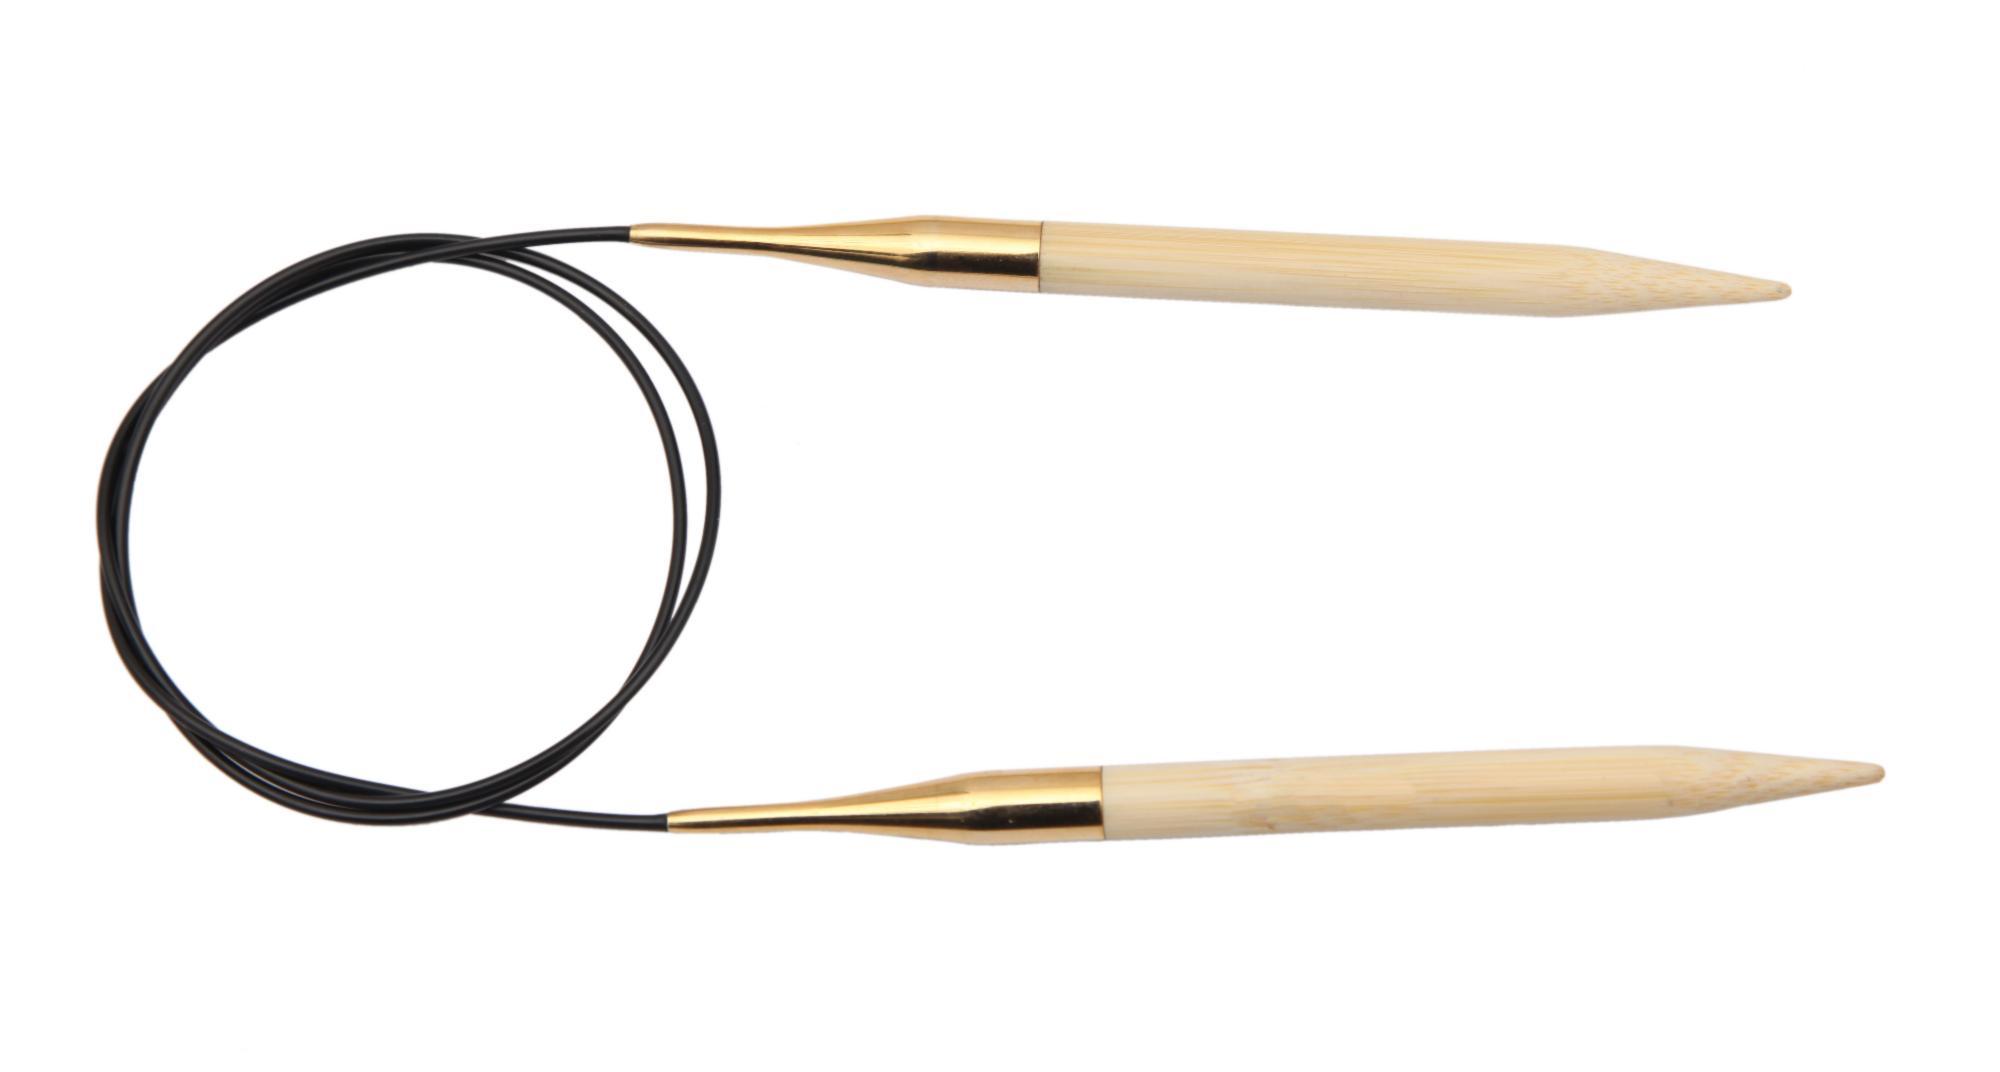 Спицы круговые 100 см Bamboo KnitPro, 22267, 4.00 мм